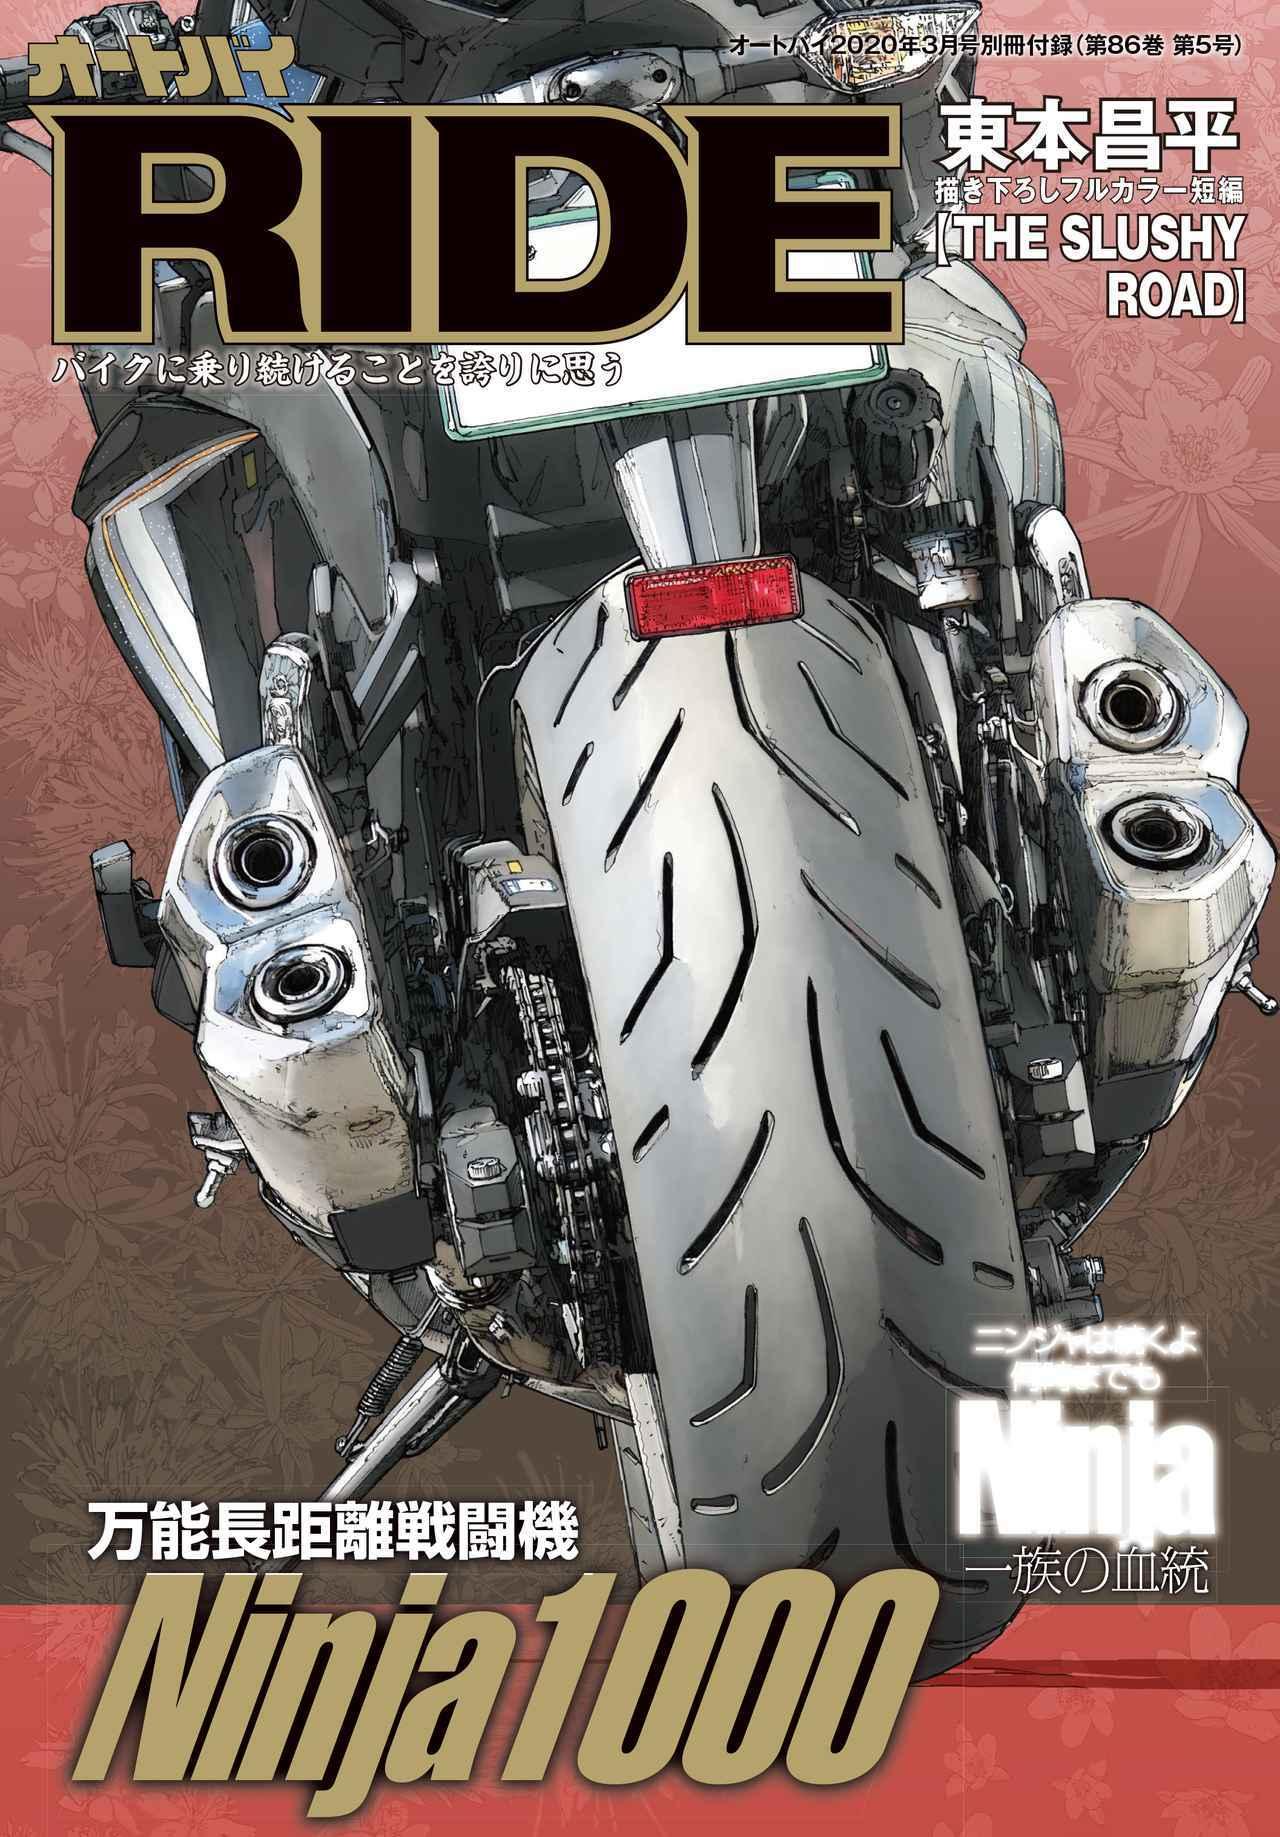 画像1: 別冊付録「RIDE」はNinja1000大特集!